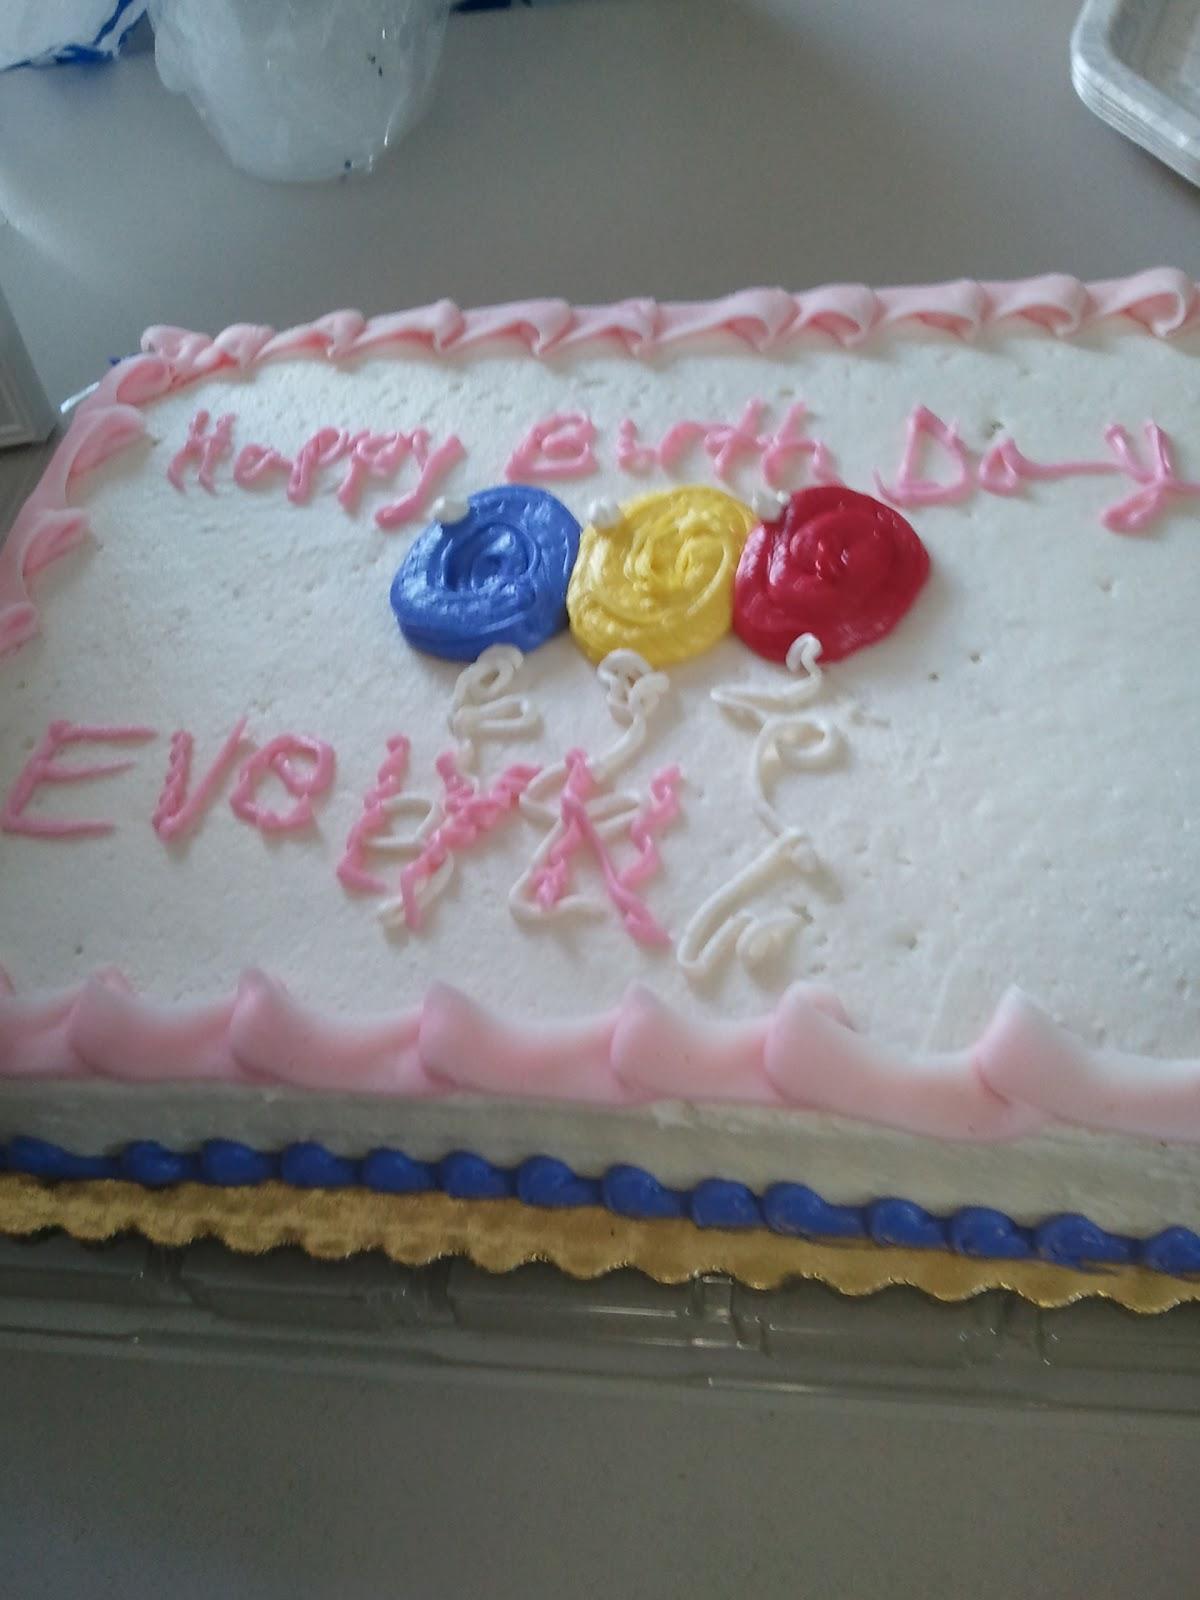 Stupendous 11 Cakes At Wegmans Photo Wegmans Bakery Birthday Cakes Wegmans Funny Birthday Cards Online Elaedamsfinfo